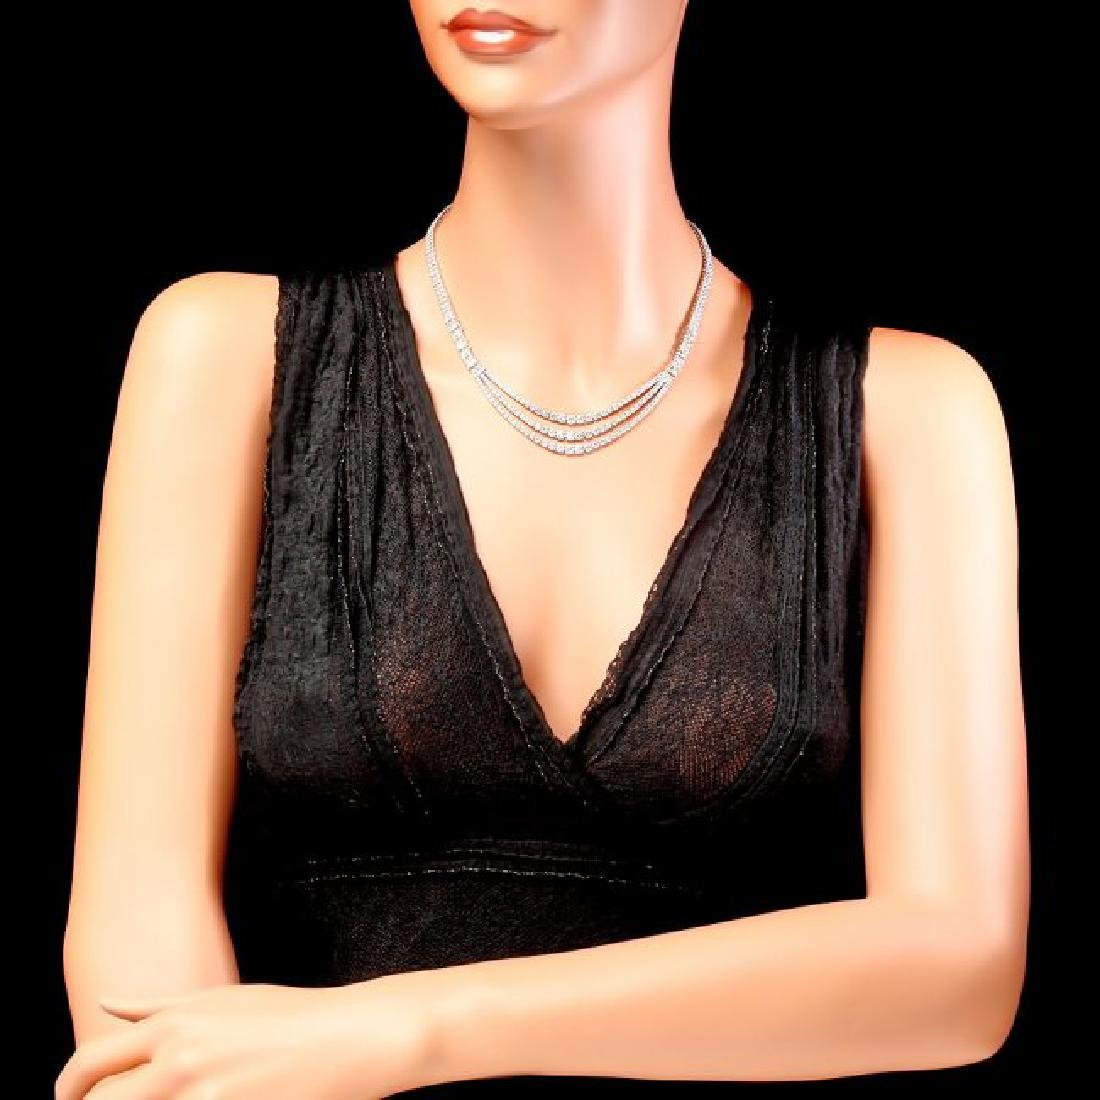 18k White Gold 23ct Diamond Necklace - 3